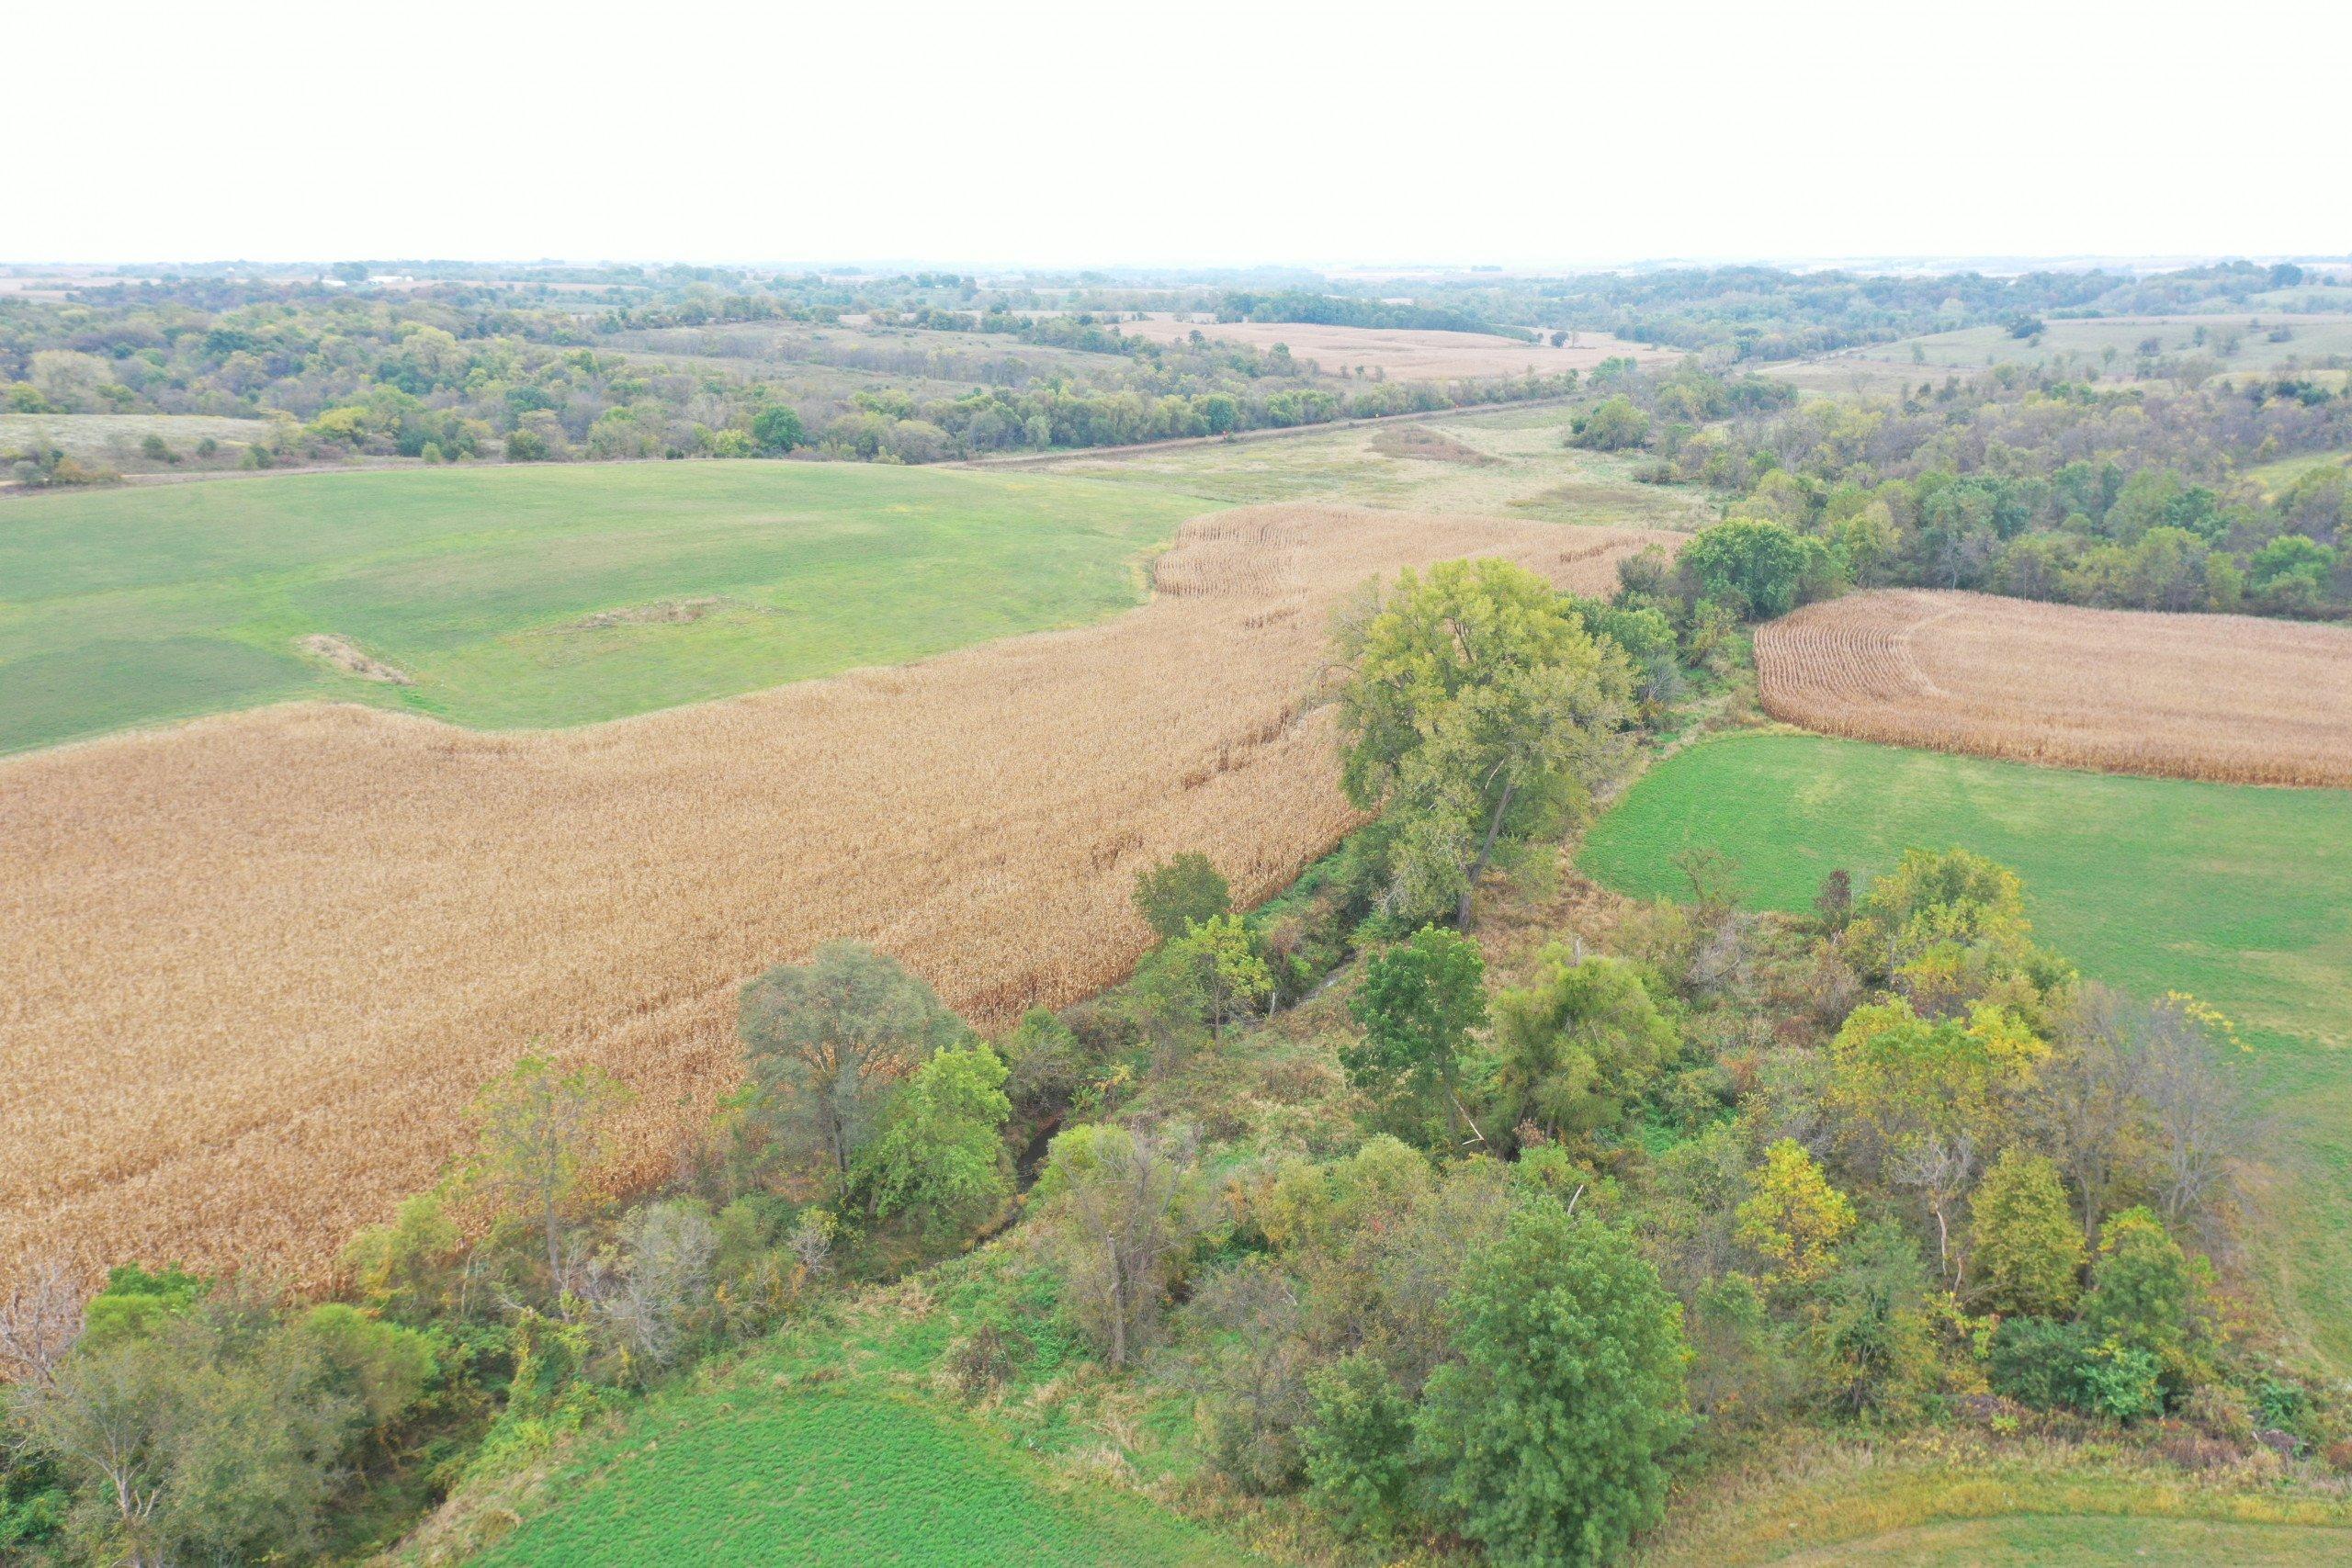 land-warren-county-iowa-200-acres-listing-number-15810-DJI_0561-1.jpg